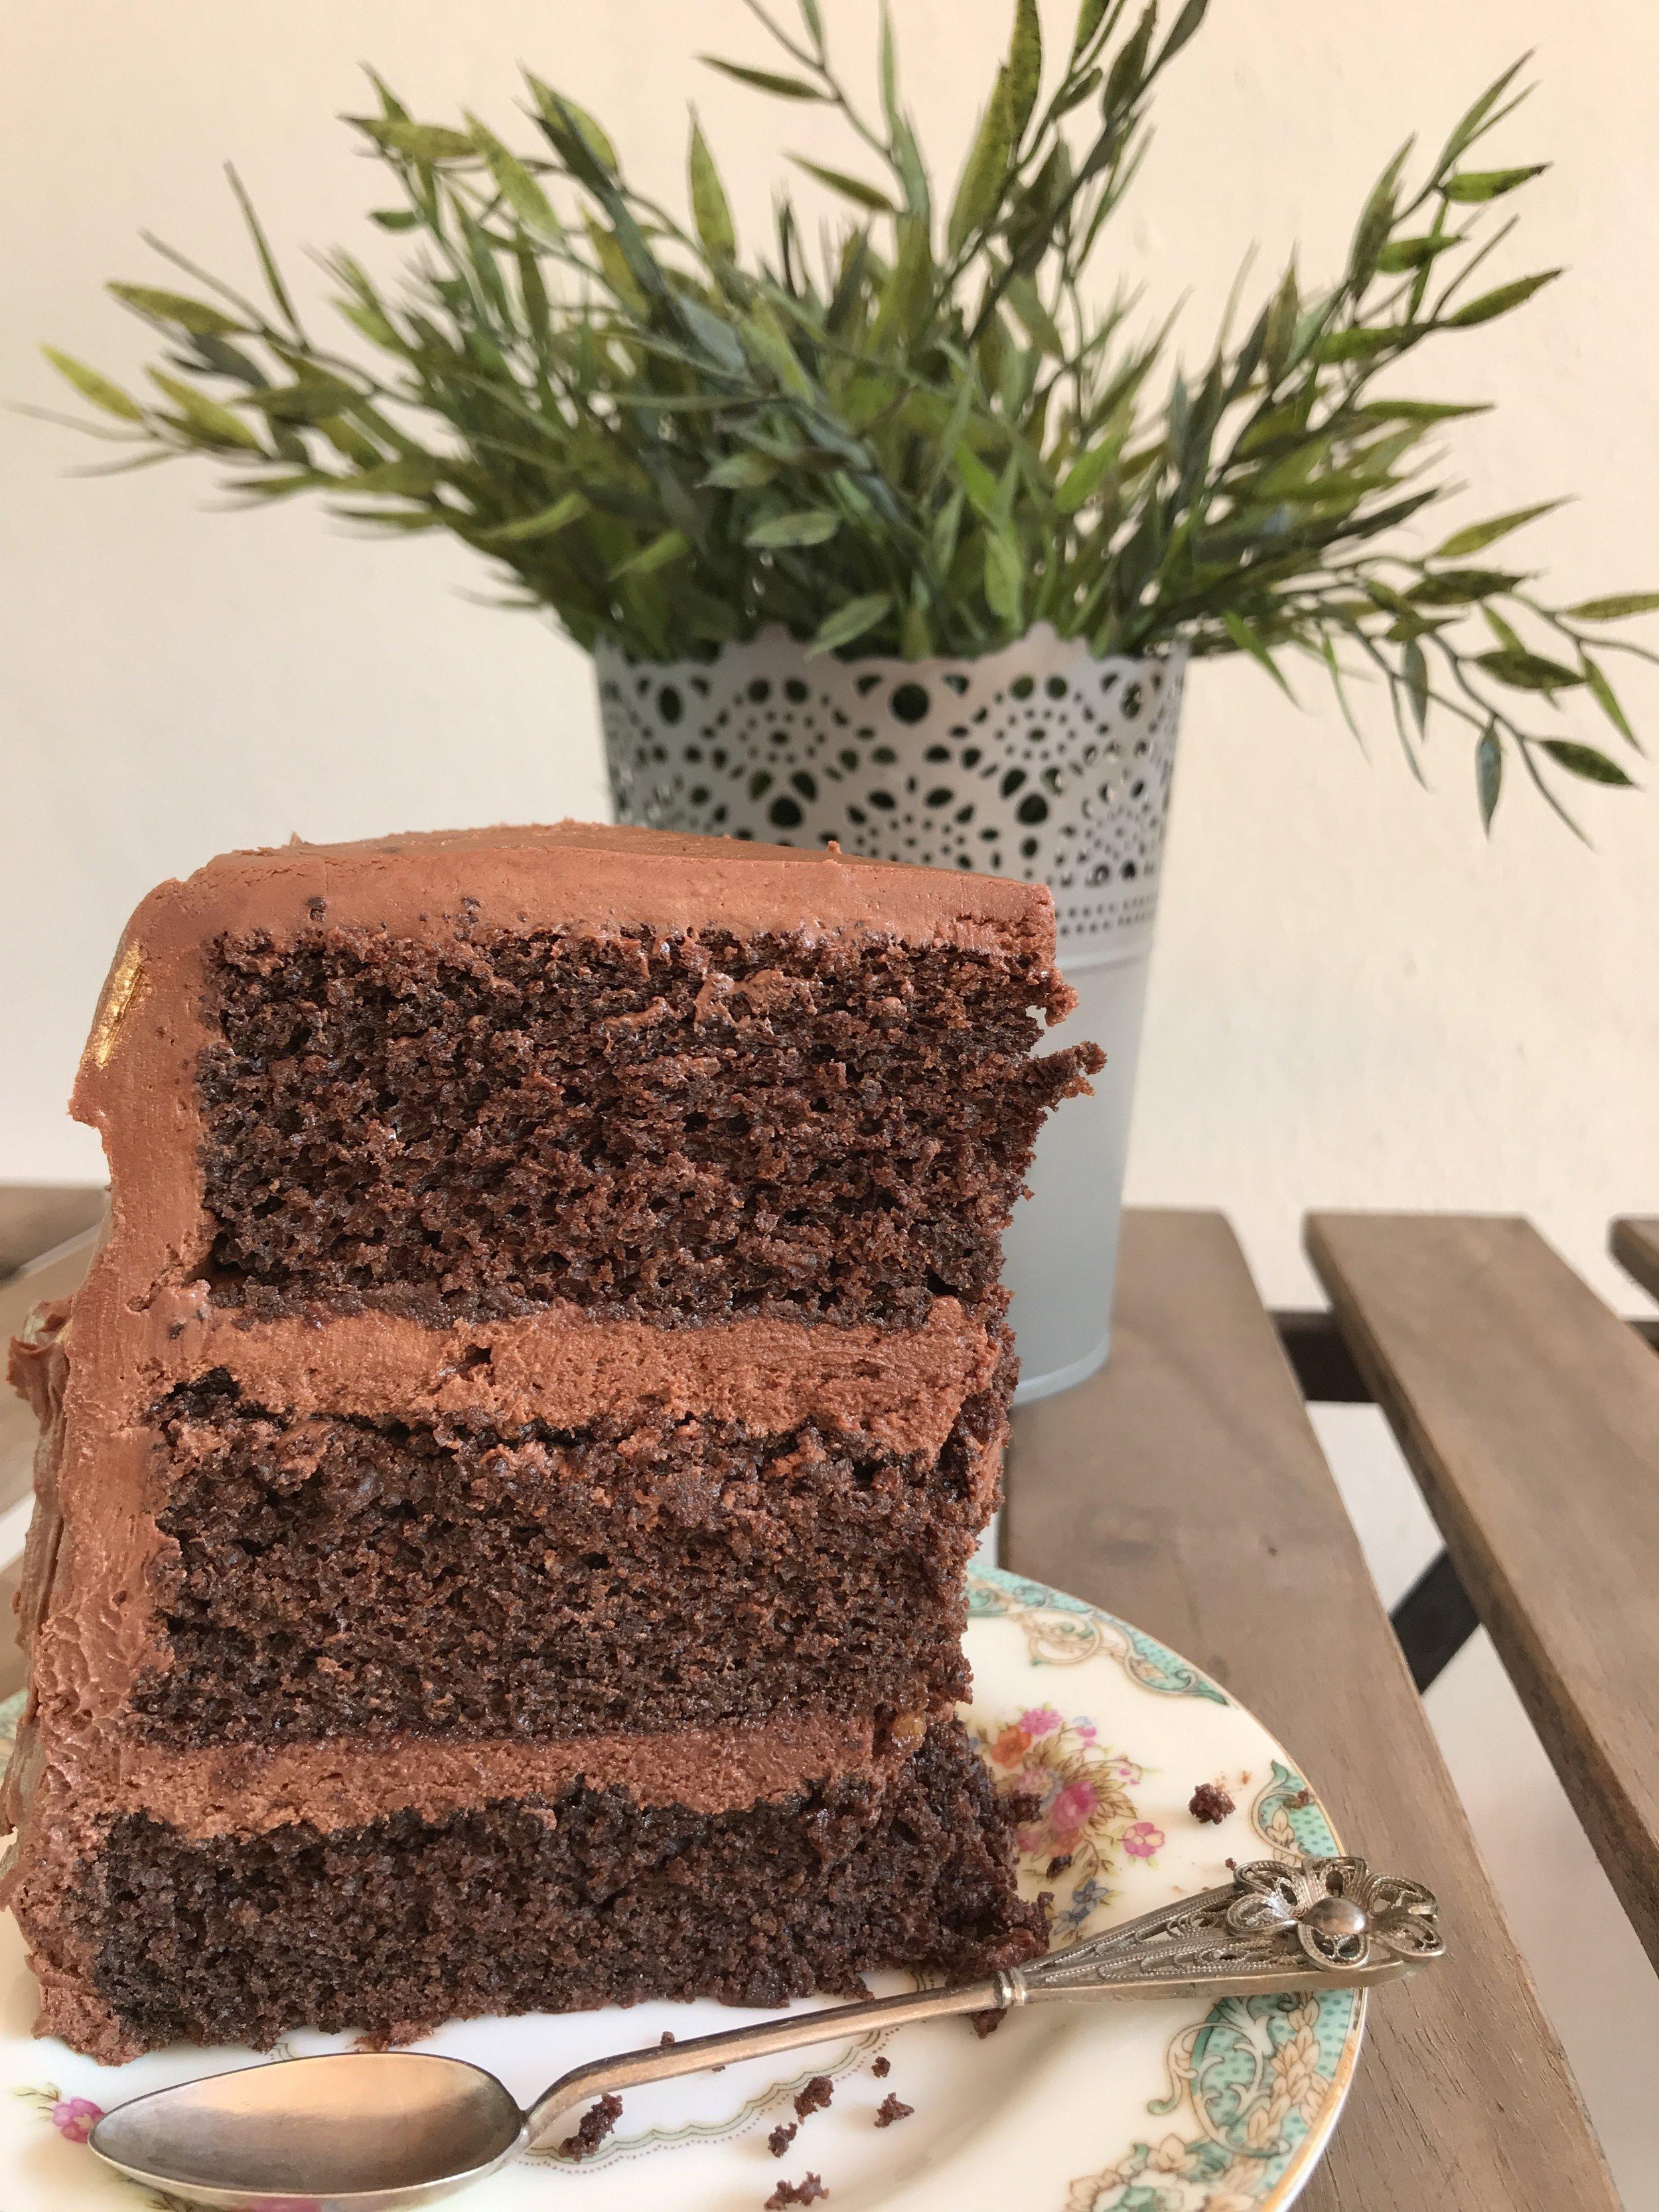 Inside of the chocolate cake.